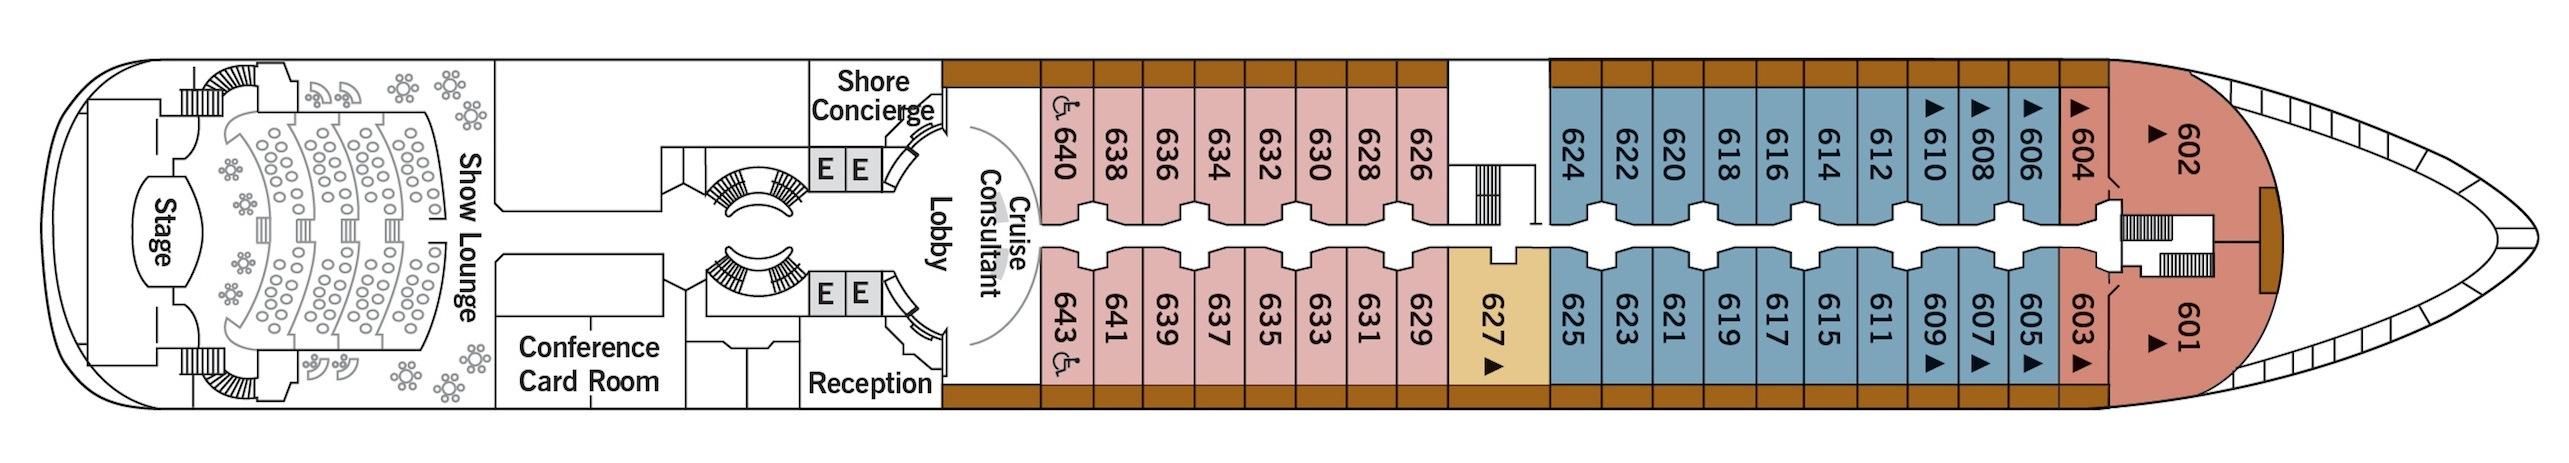 Silversea Cruises Silver Wind Deck Plans Deck 6.jpg